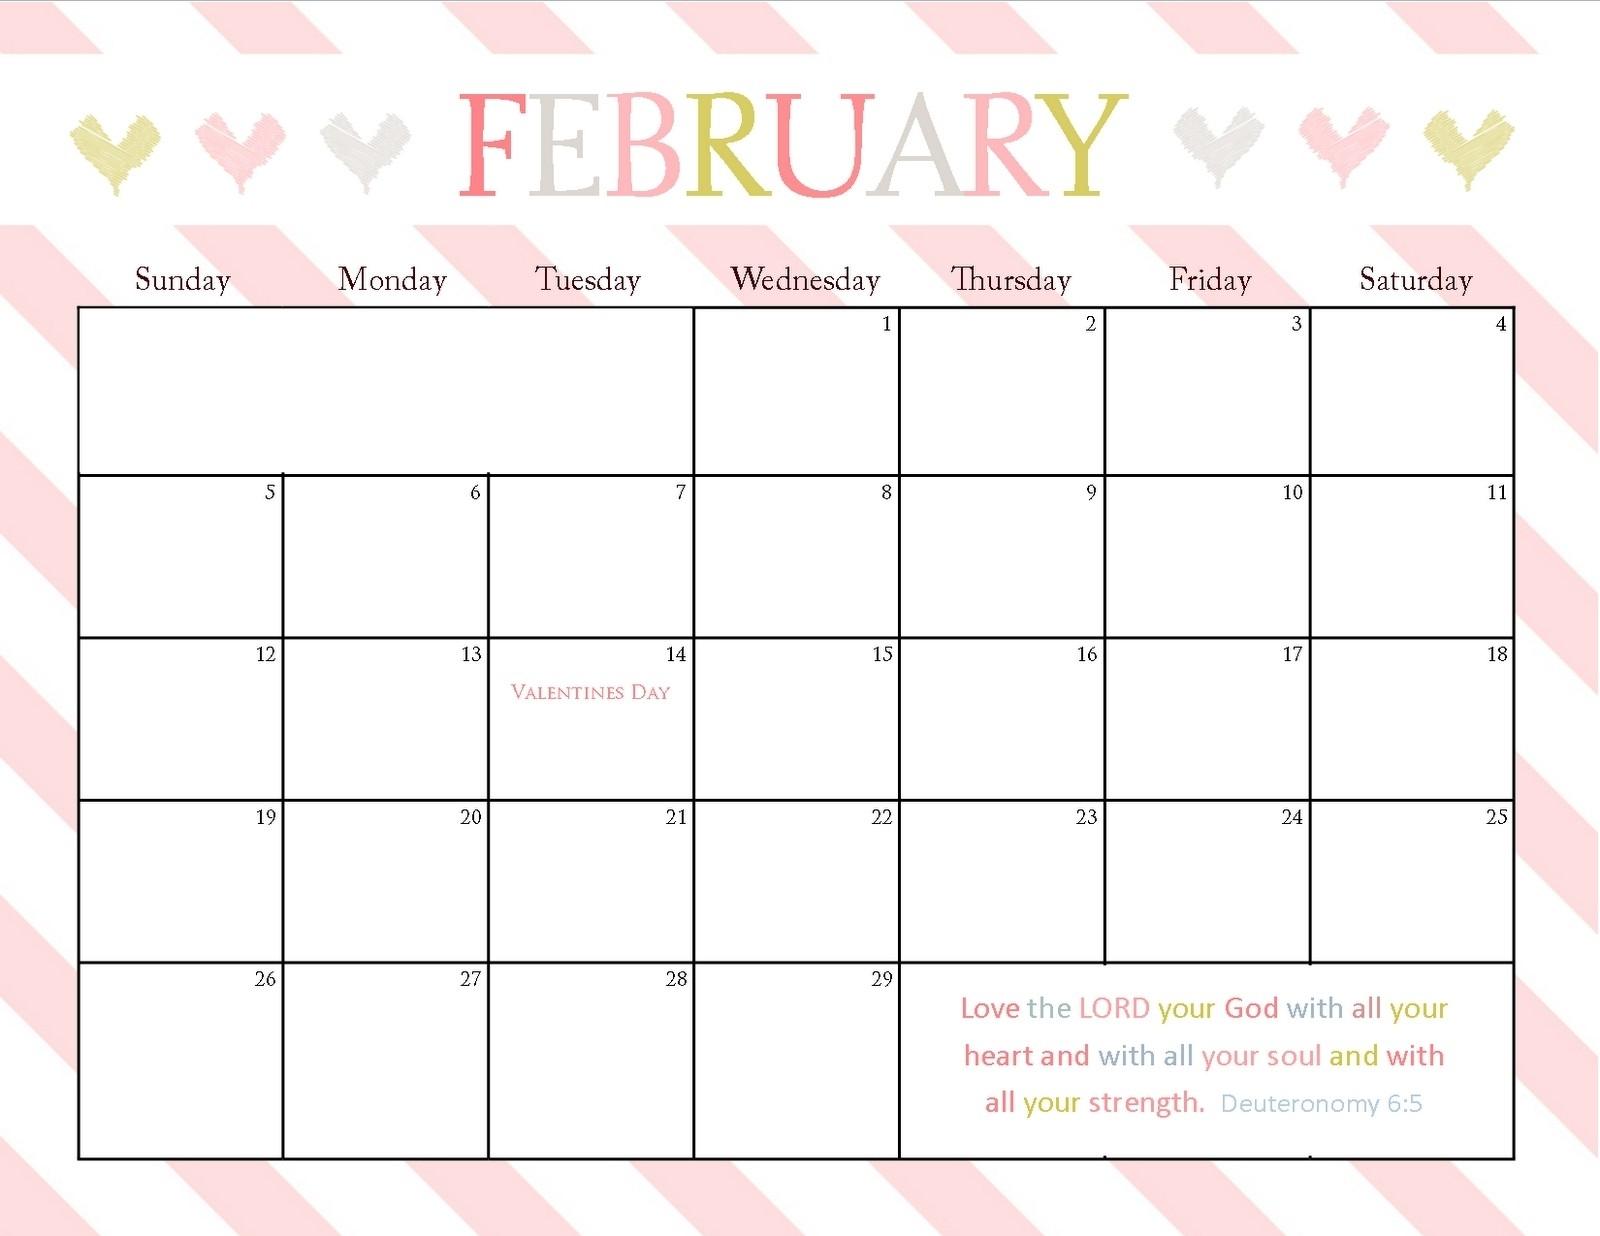 8.5 X 11 Calendar Template | Calendar Template Printable Monthly Yearly-8.5 X 11 Calendar Print